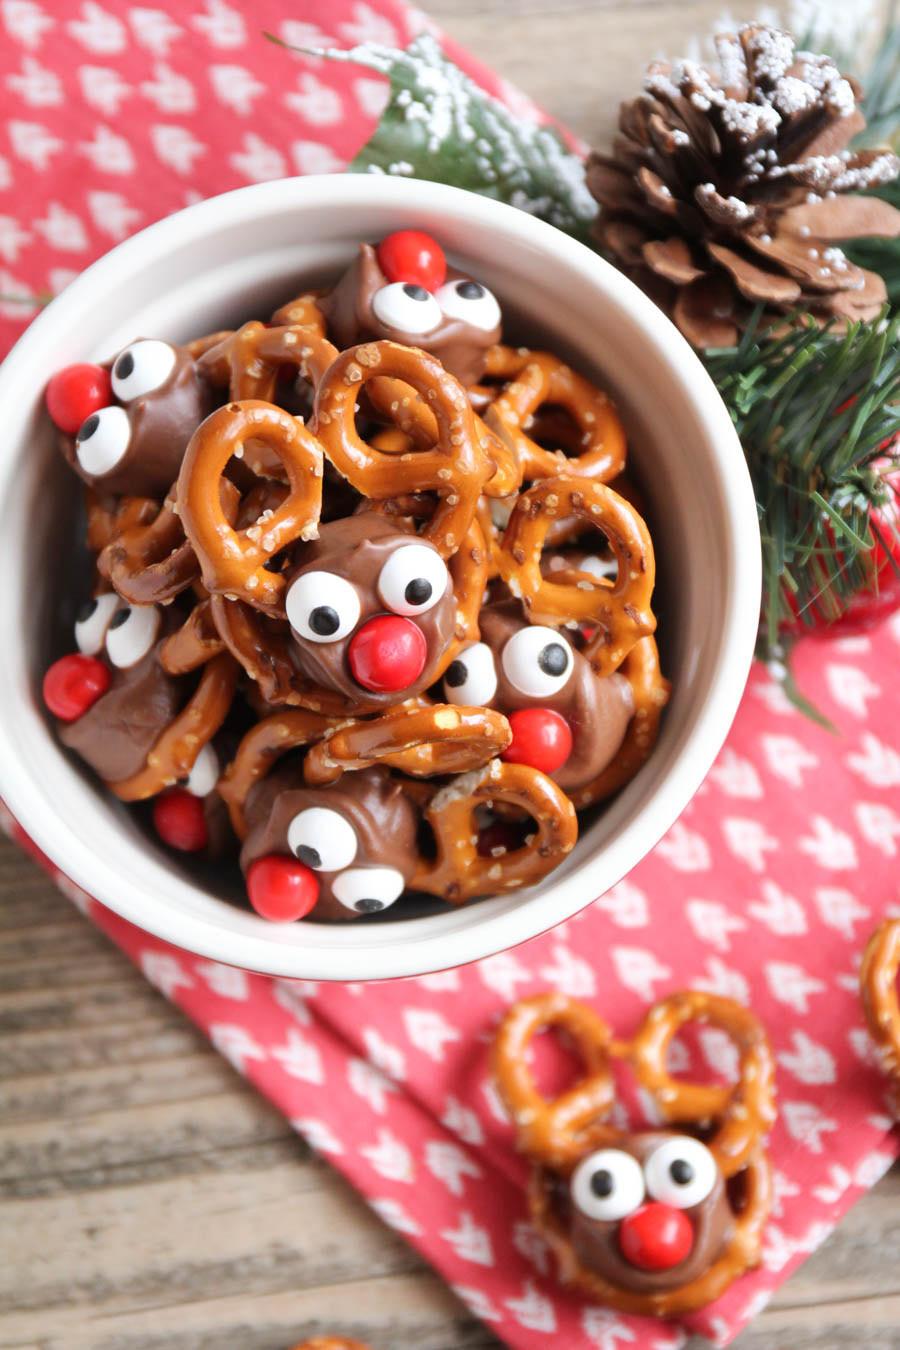 Pretzel Christmas Cookies  25 Fun Christmas Treat Ideas – Fun Squared